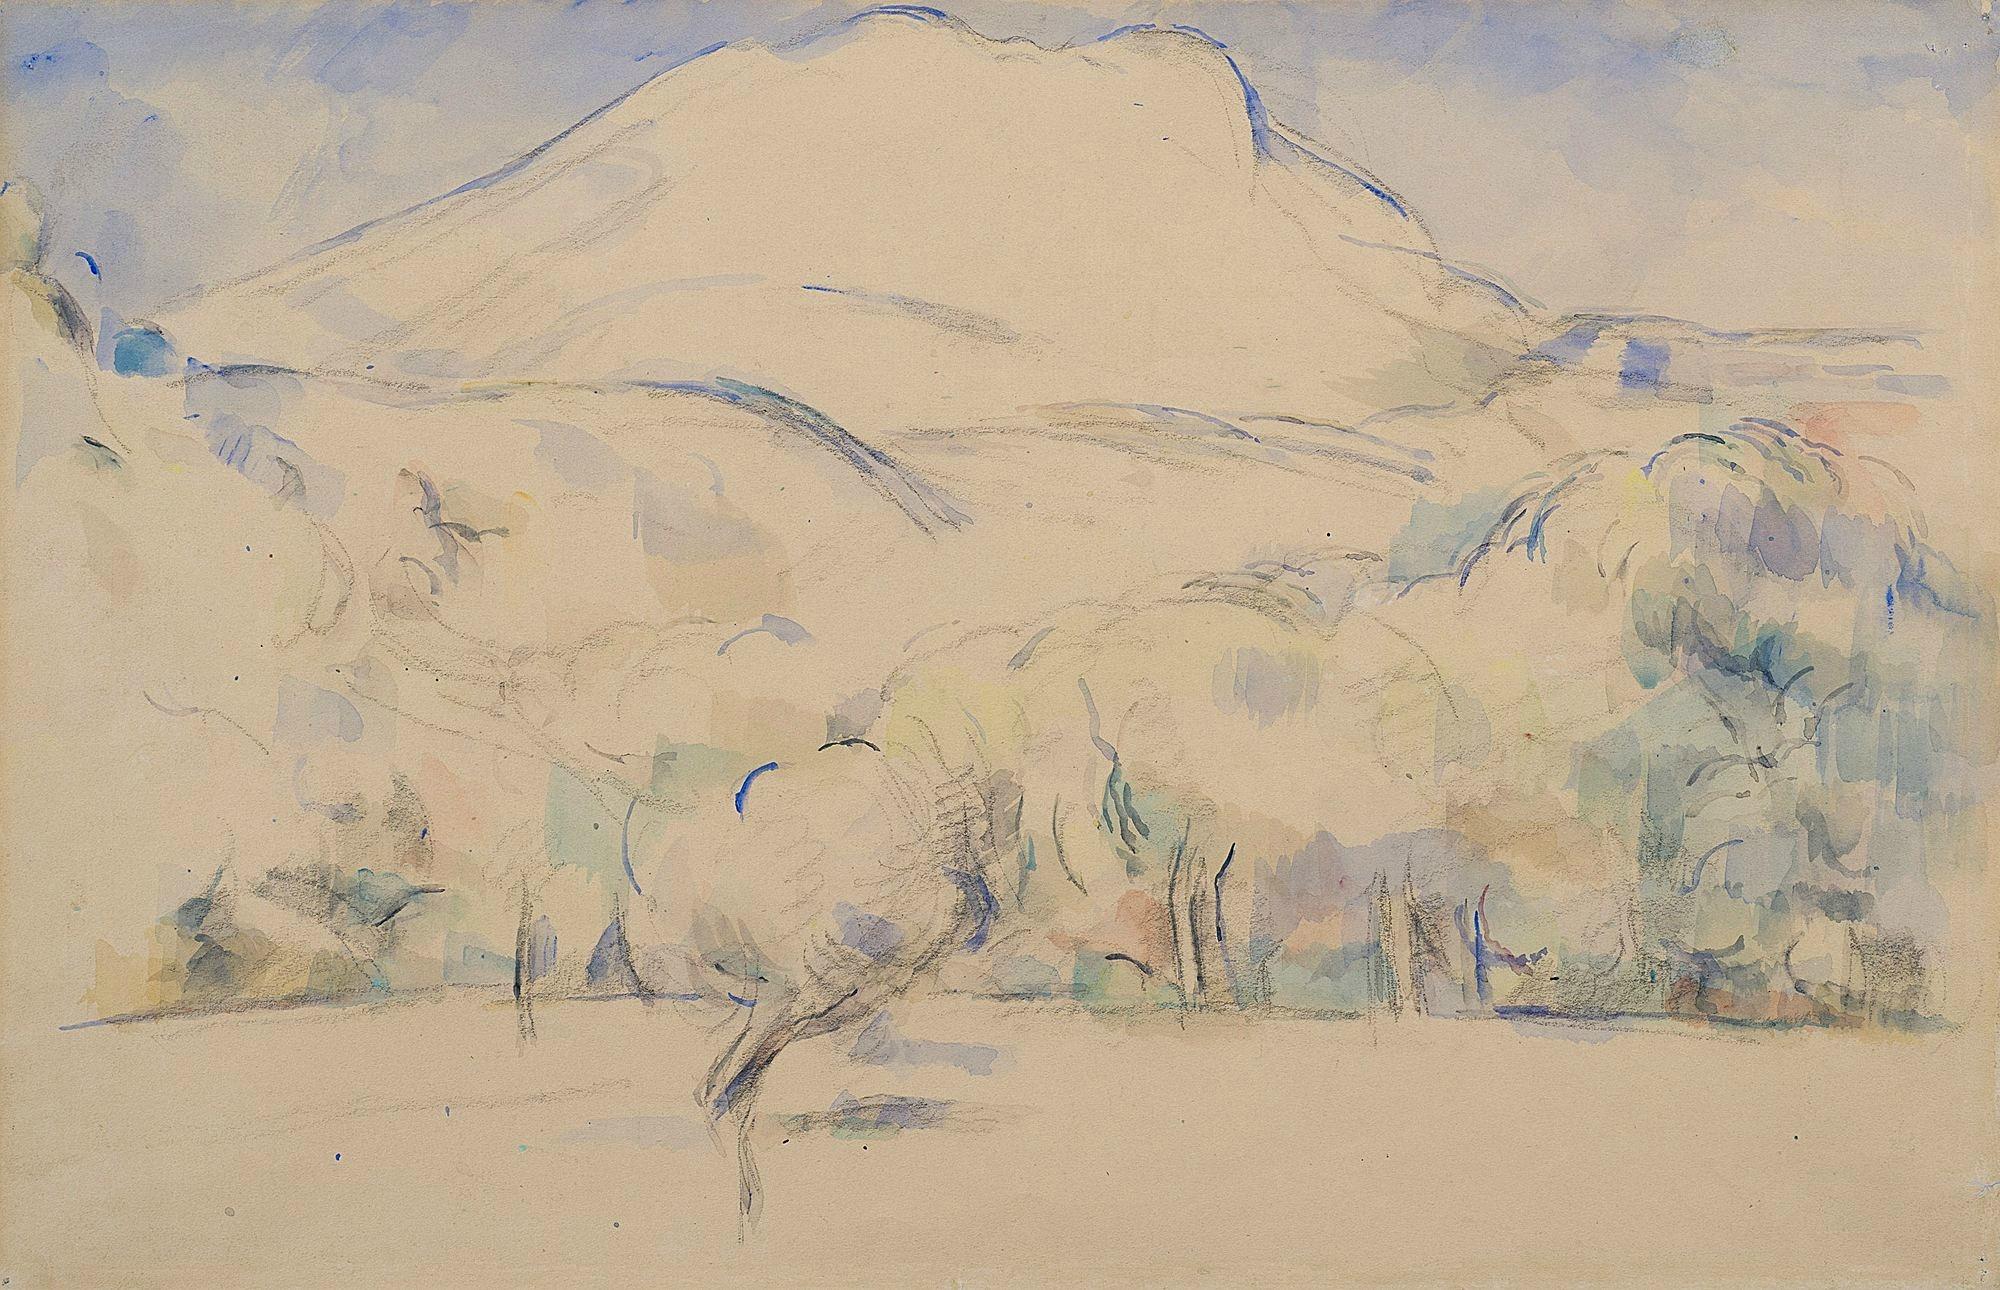 Mont Sainte-Victoire  (c. 1890) Paul Cézanne. 28 x 44.5 cm, watercolour on paper. Offered by Dickinson at TEFAF 2018.